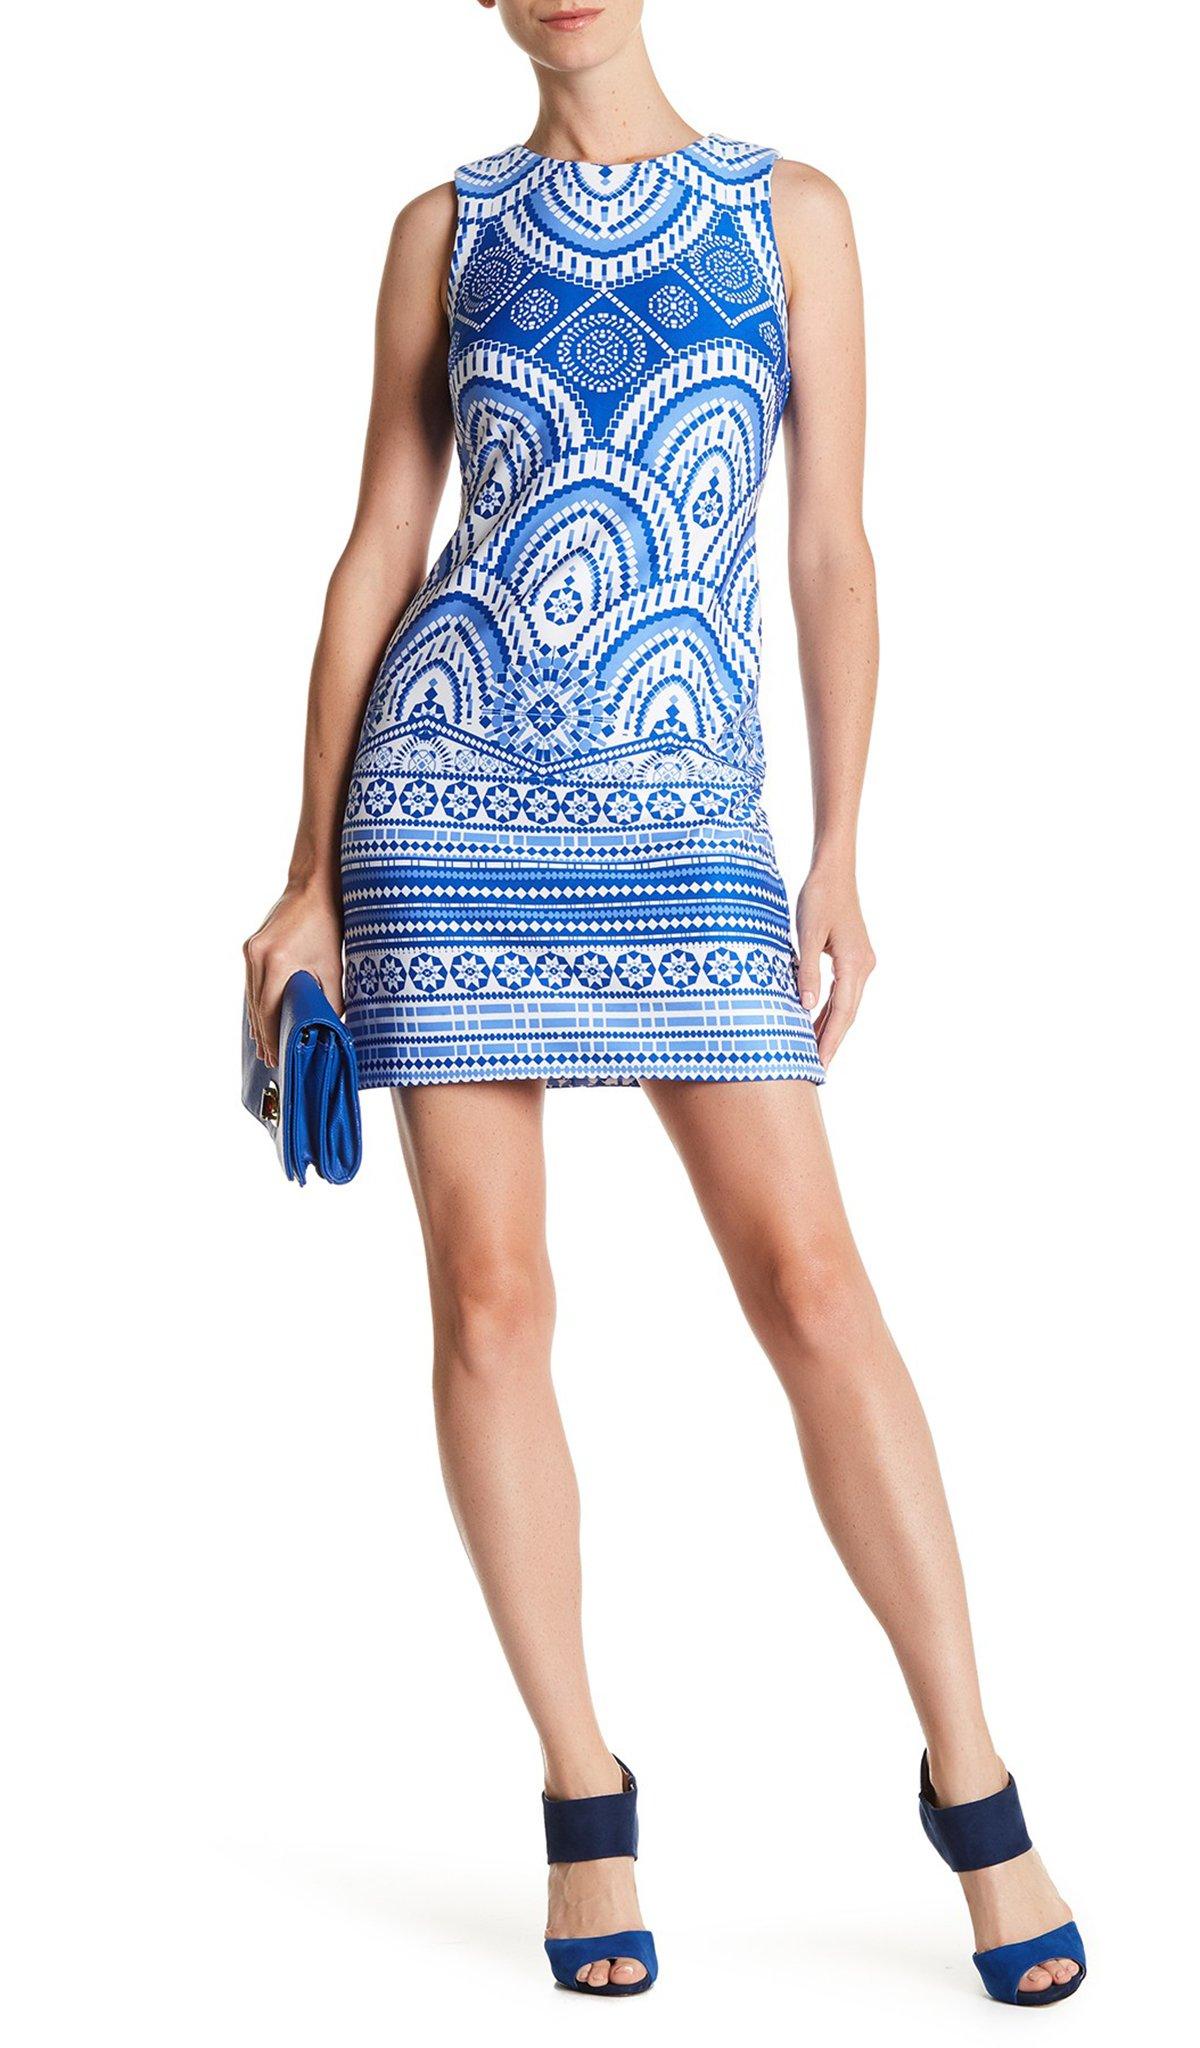 Taylor - 8167MJ Printed Jewel Cocktail Dress